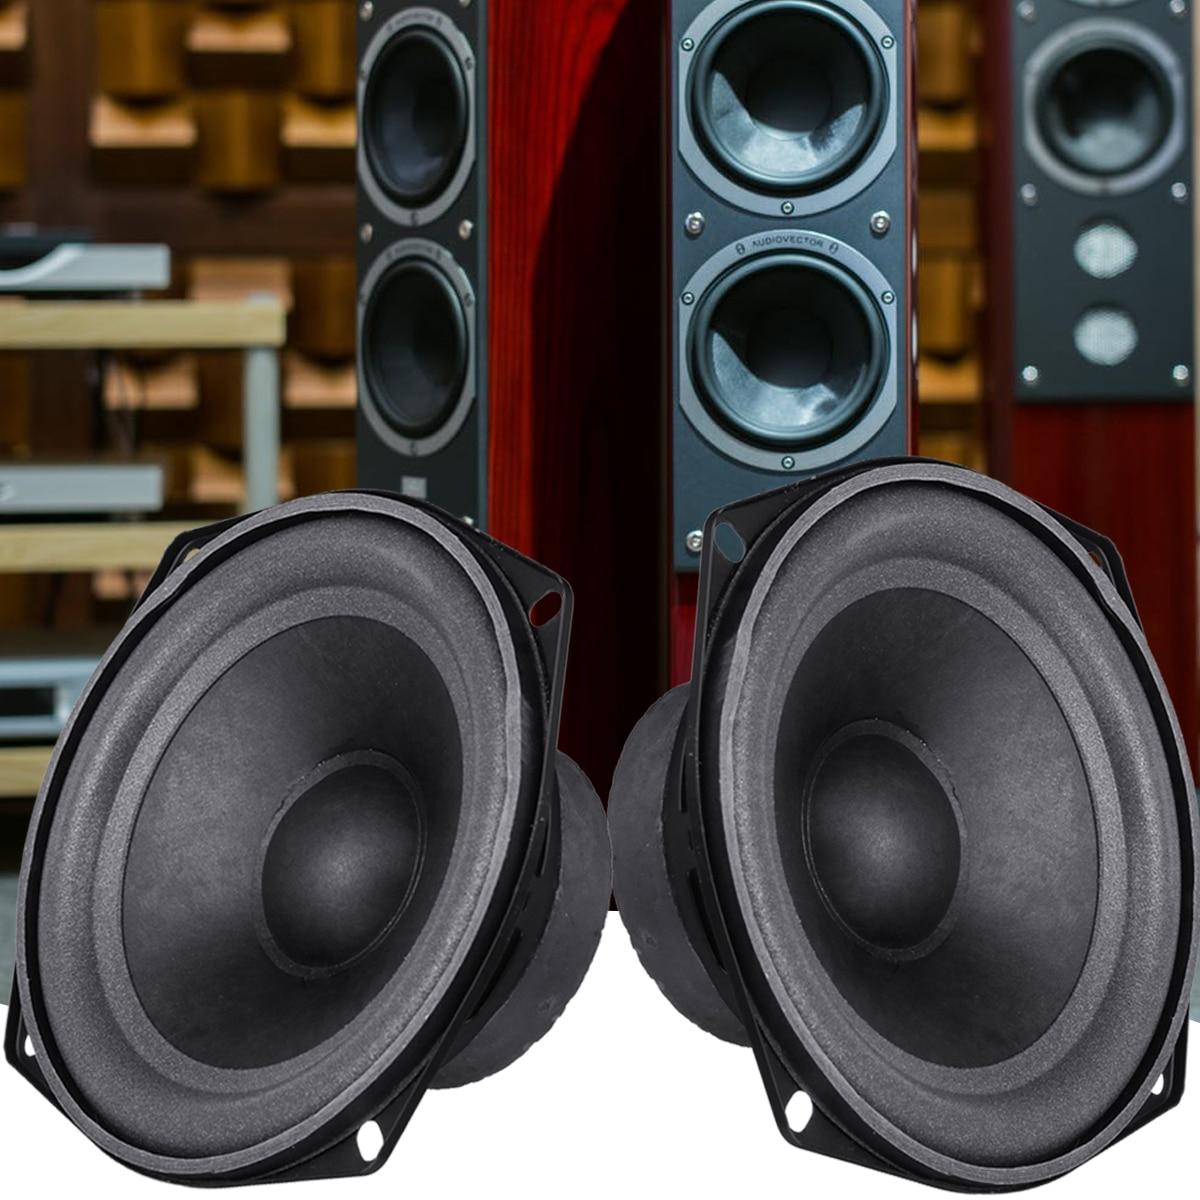 2pcs 5.5inch DIY Bass Horn Speaker Unit Accessories Sound Box Loudspeaker Stereo Subwoofer Speaker Unit Strong Bass Horn Tweeter